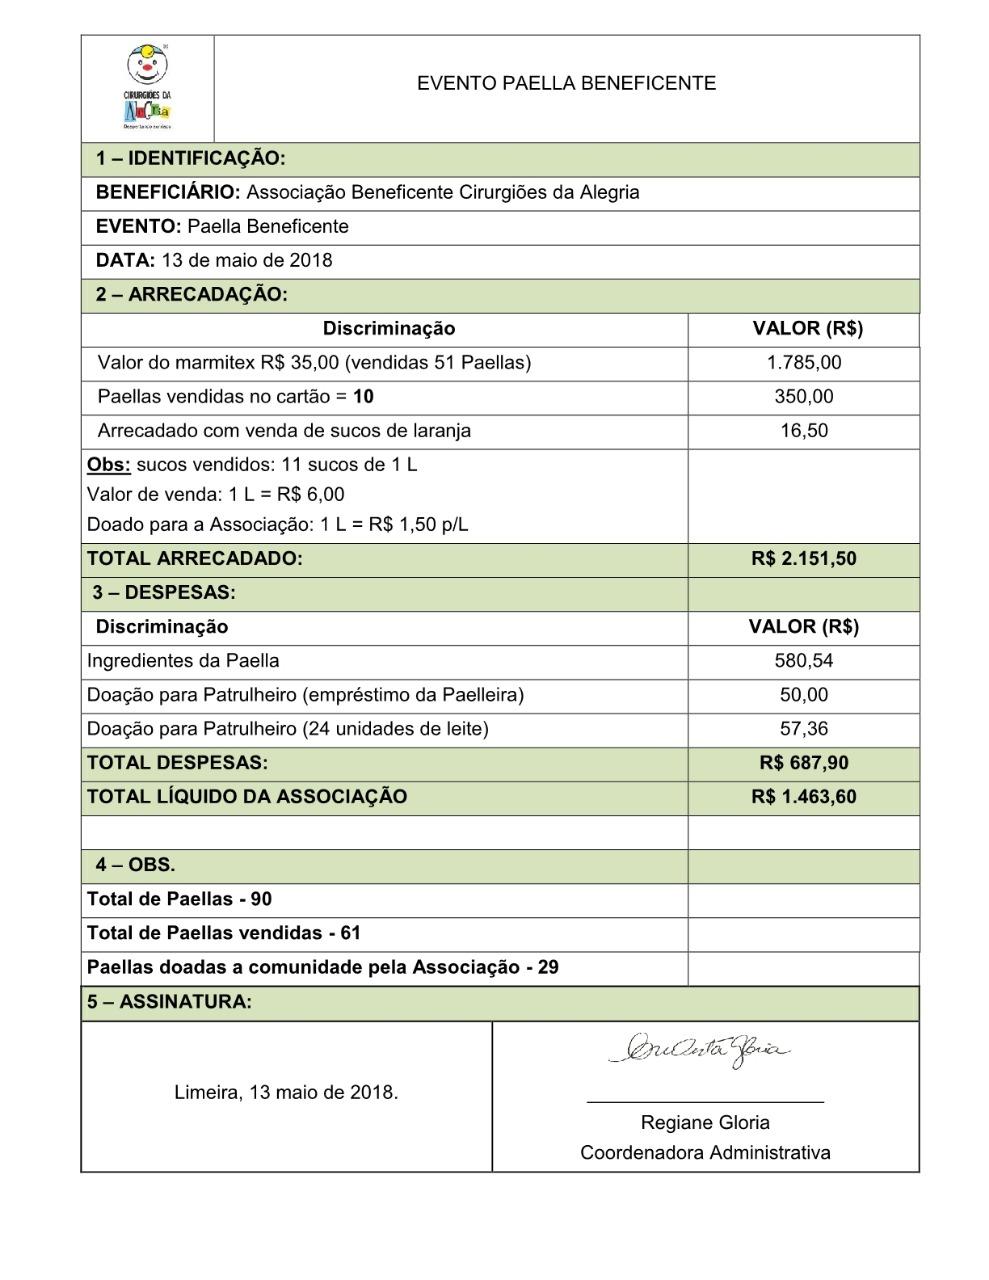 Relatório Paella Beneficente0007